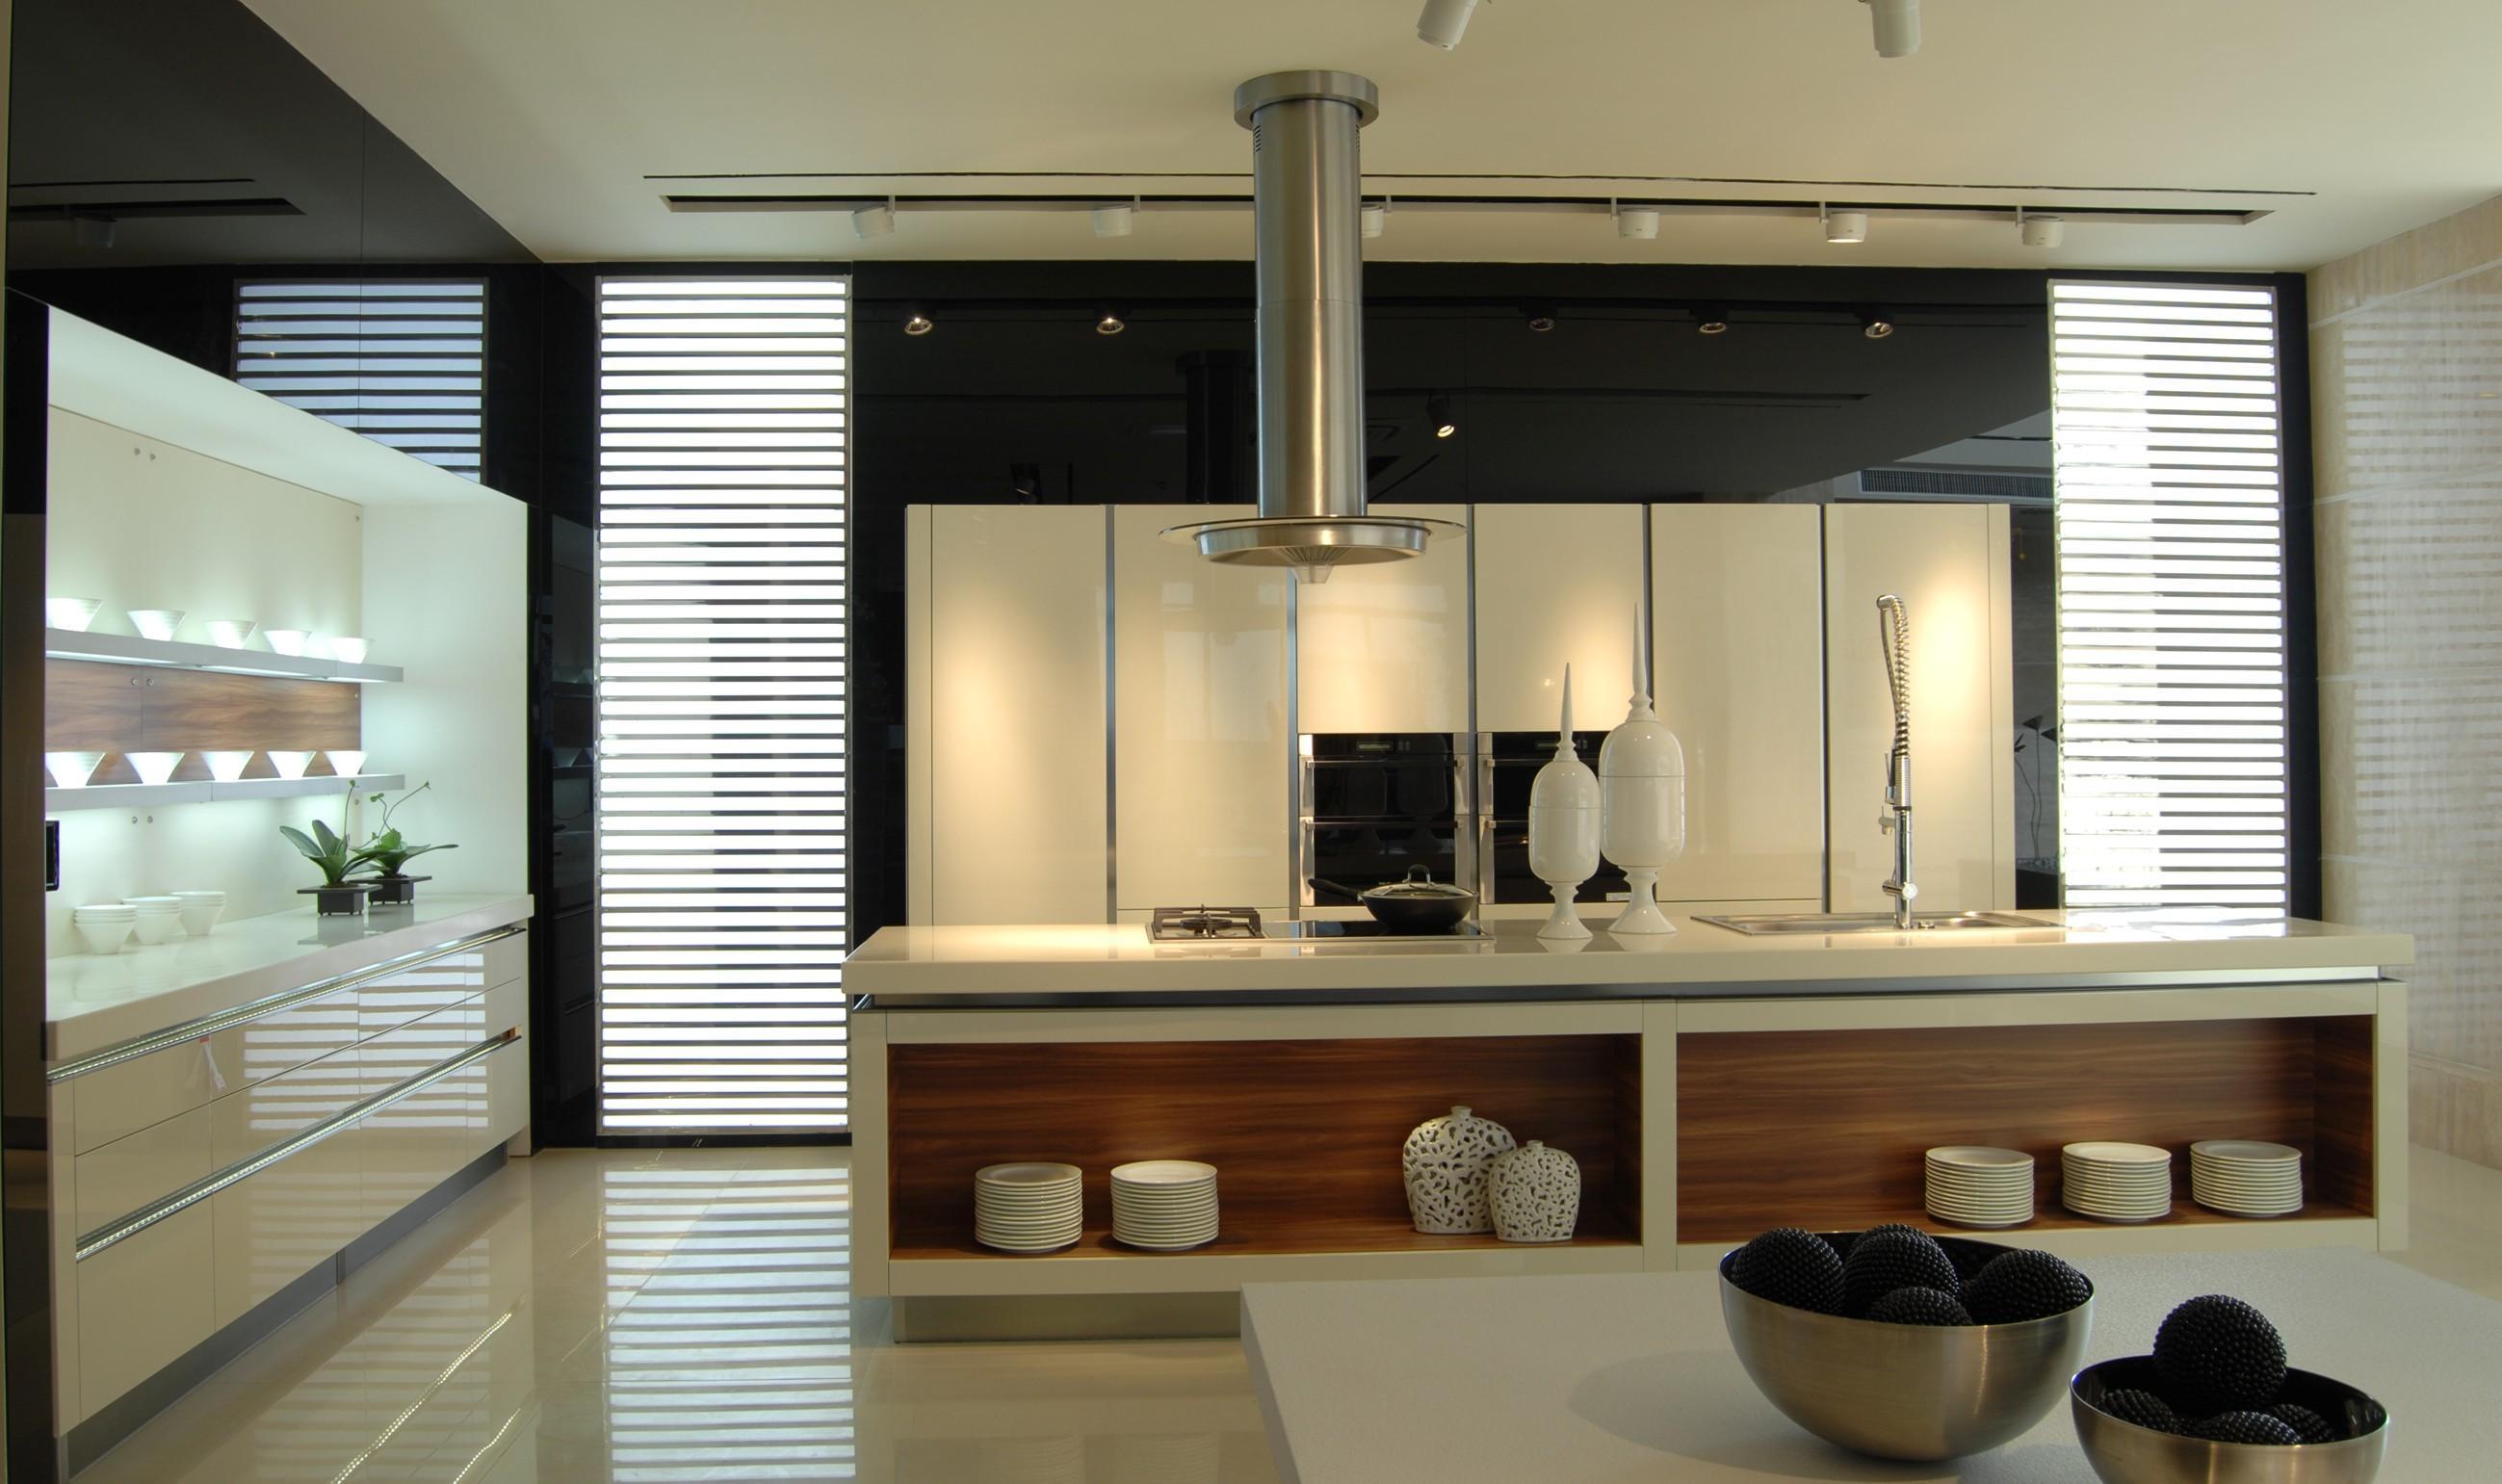 30 Awesome Modular Kitchen Designs